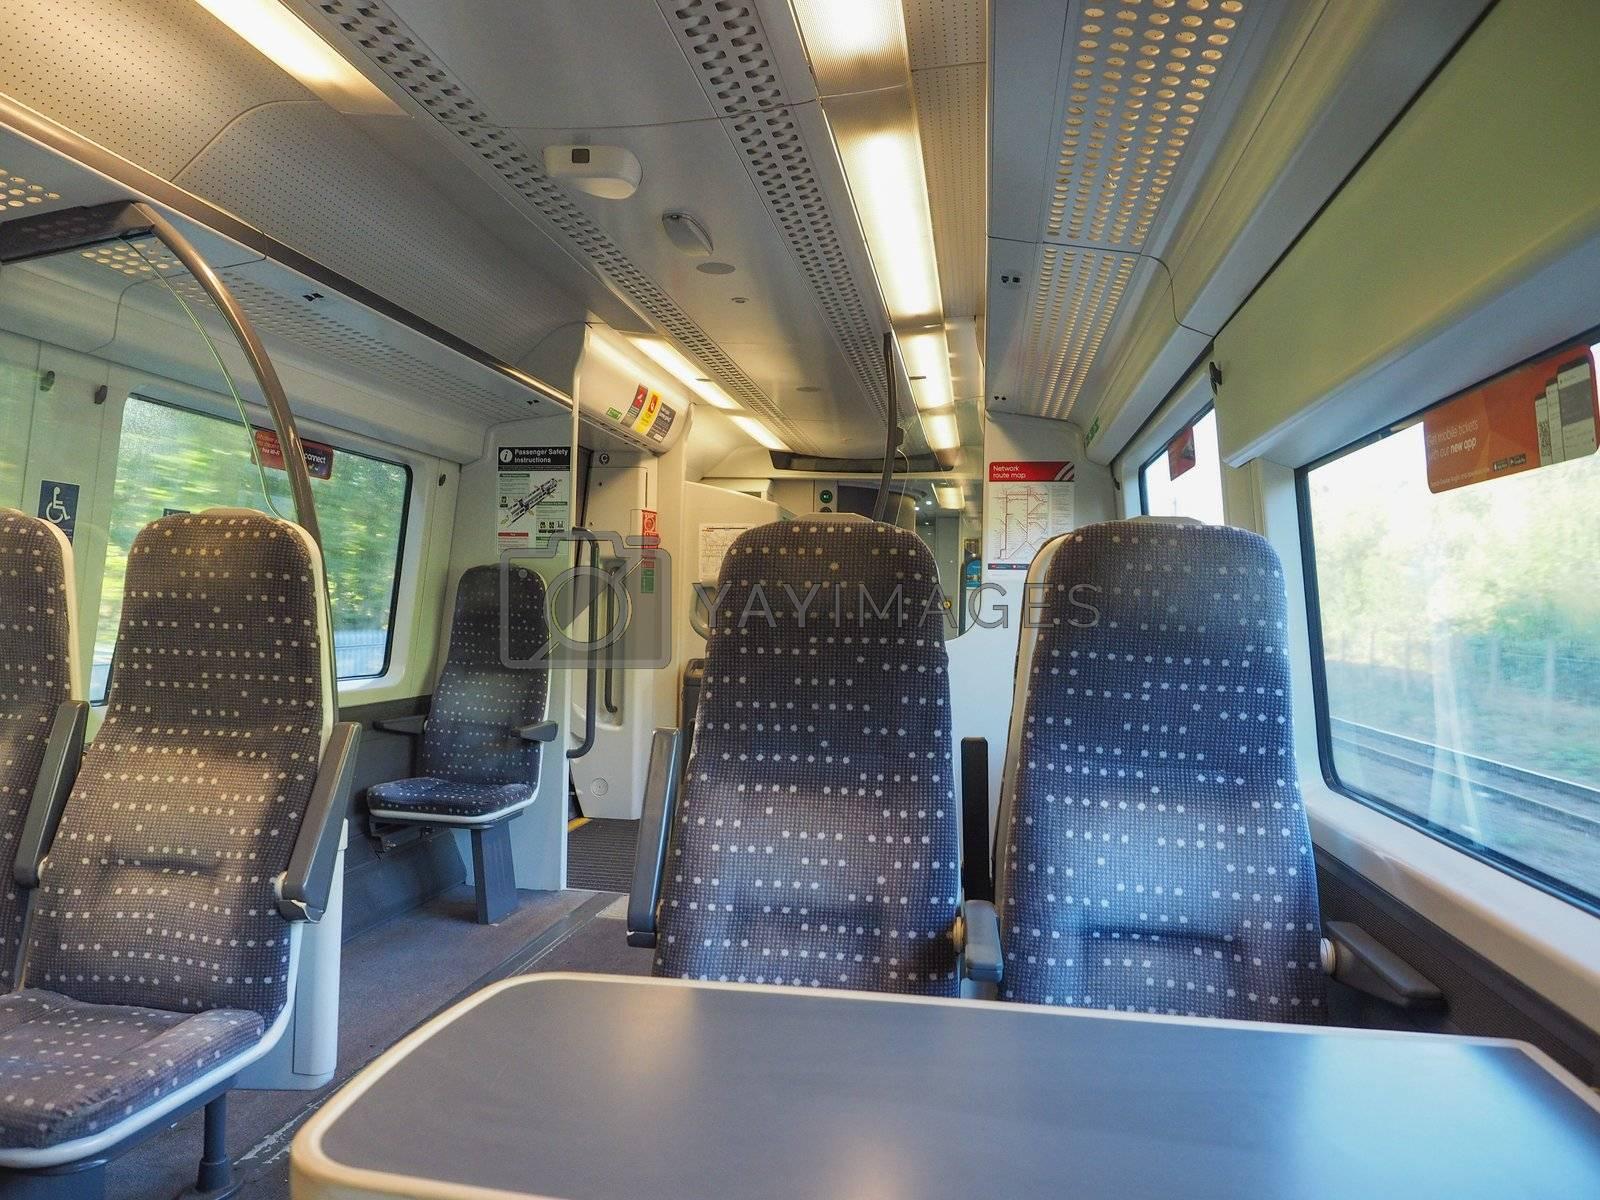 CAMBRIDGE, UK - CIRCA OCTOBER 2018: train interior